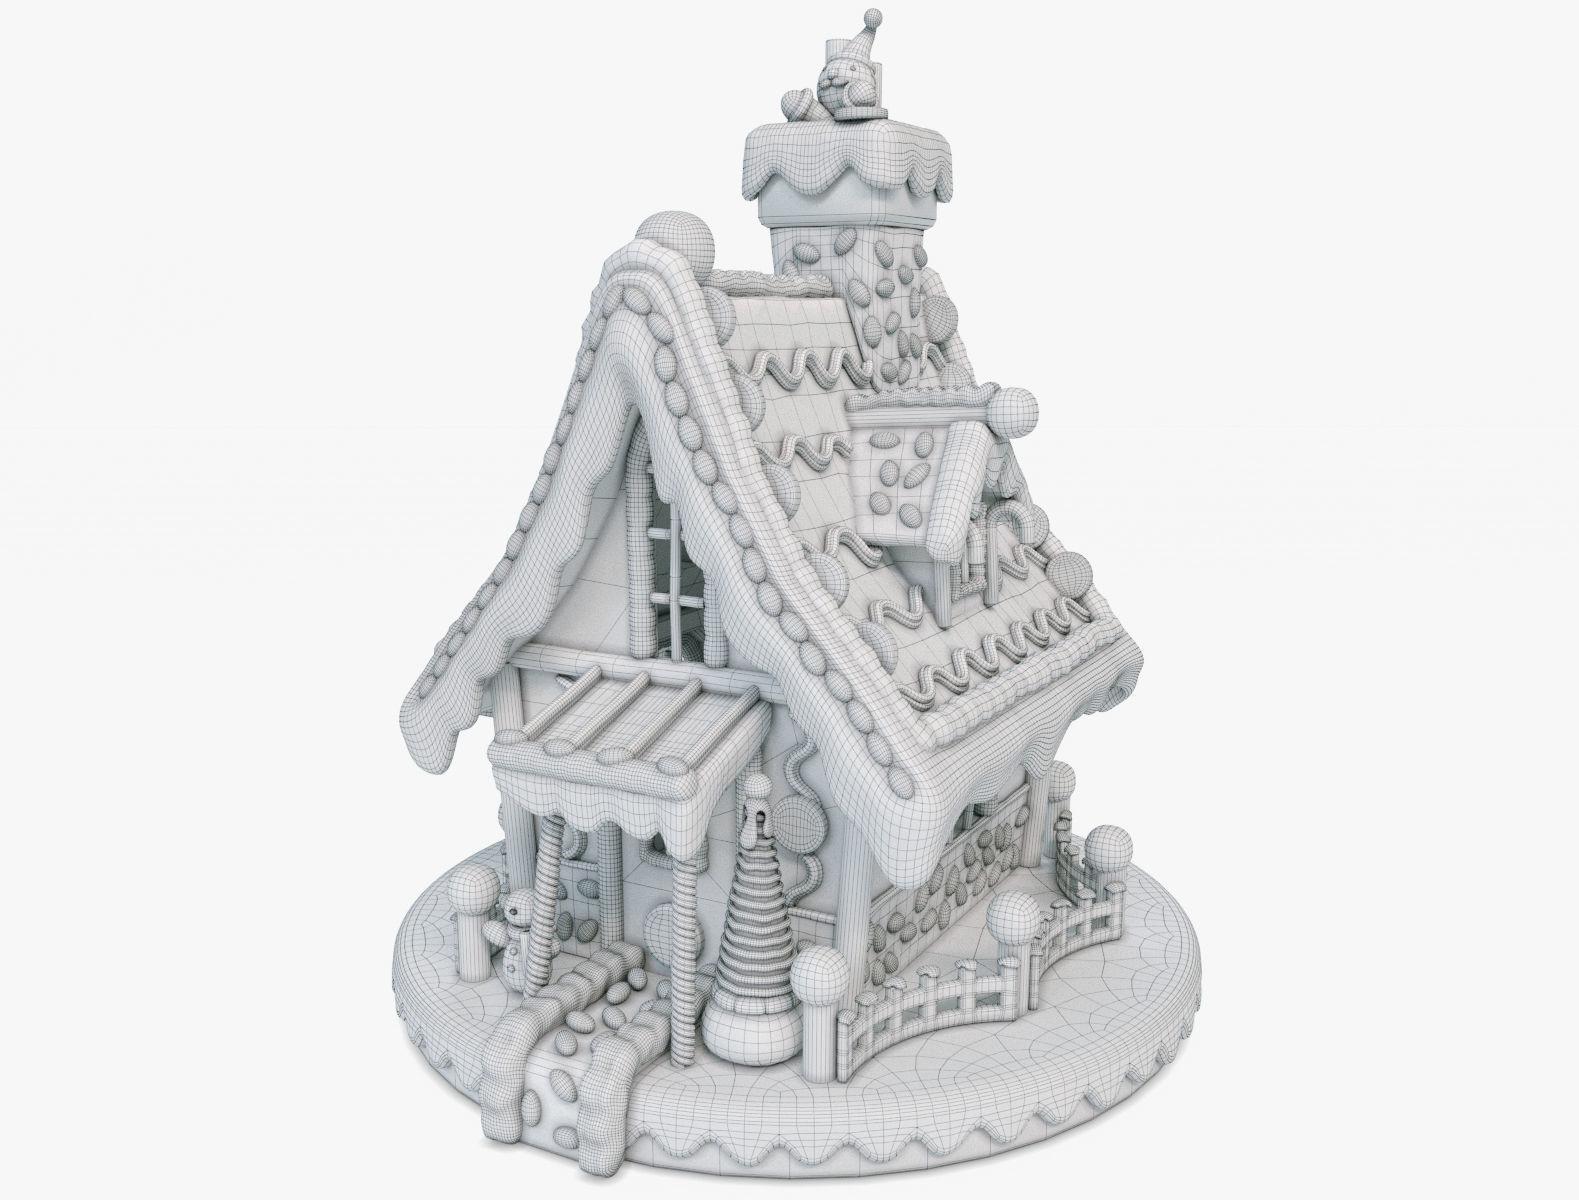 Alexander Kokorin - Gingerbread house